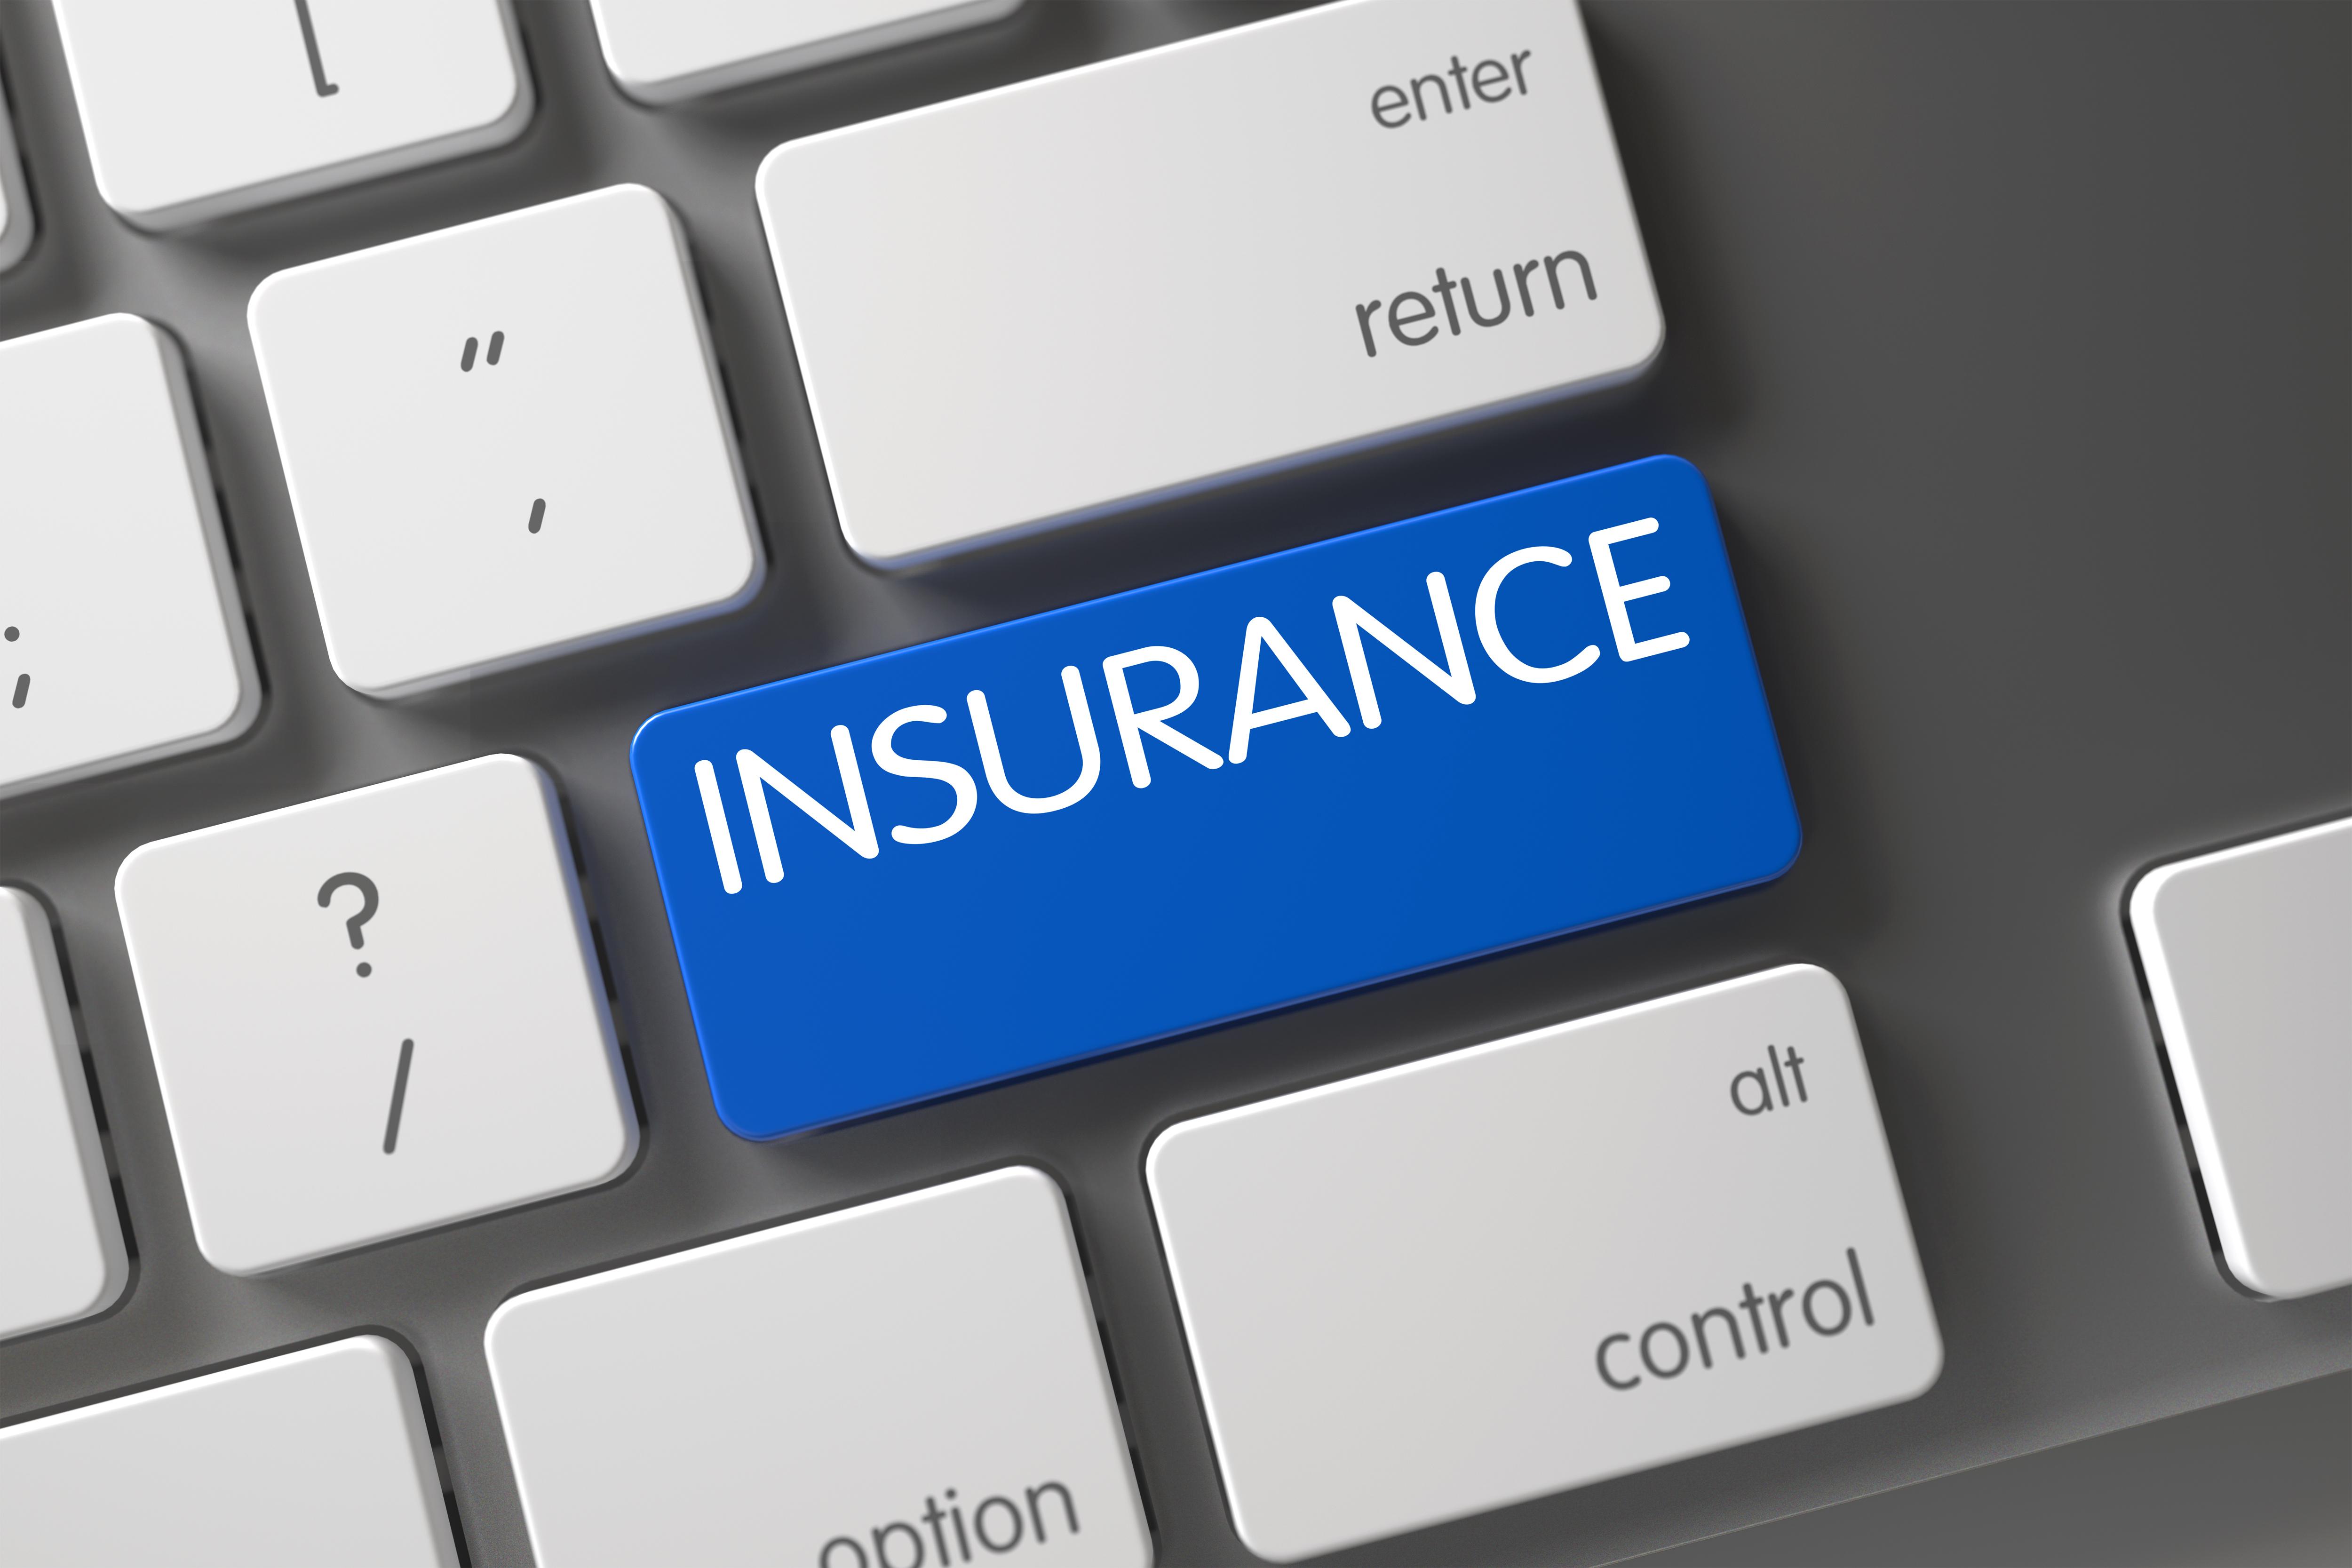 Concept of Insurance, with Insurance on Blue Enter Keypad on Modernized Keyboard. Modern Keyboard Keypad Labeled Insurance. Insurance CloseUp of Laptop Keyboard on Laptop. 3D Illustration.